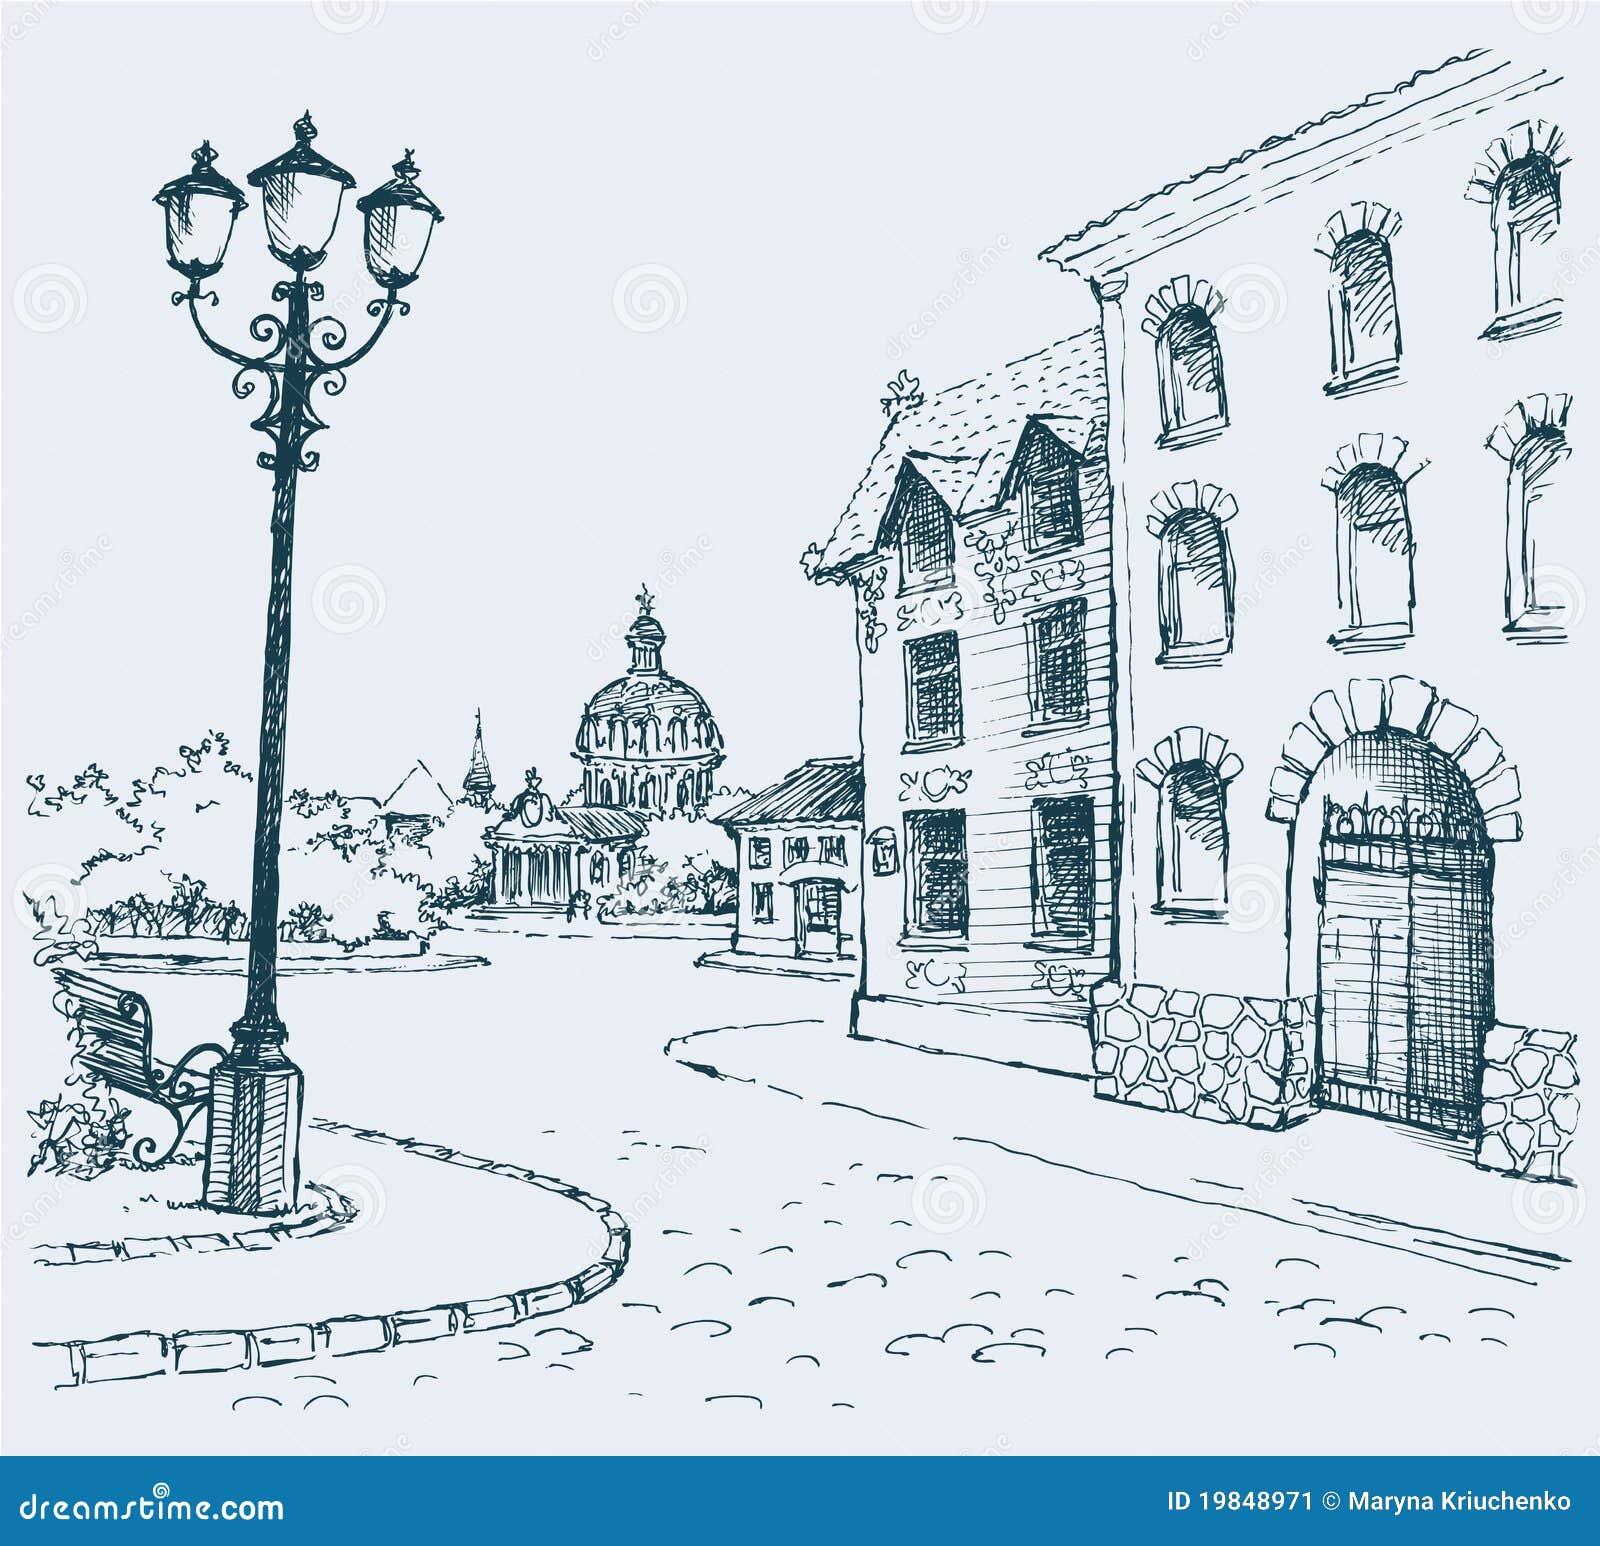 The architectural landscape